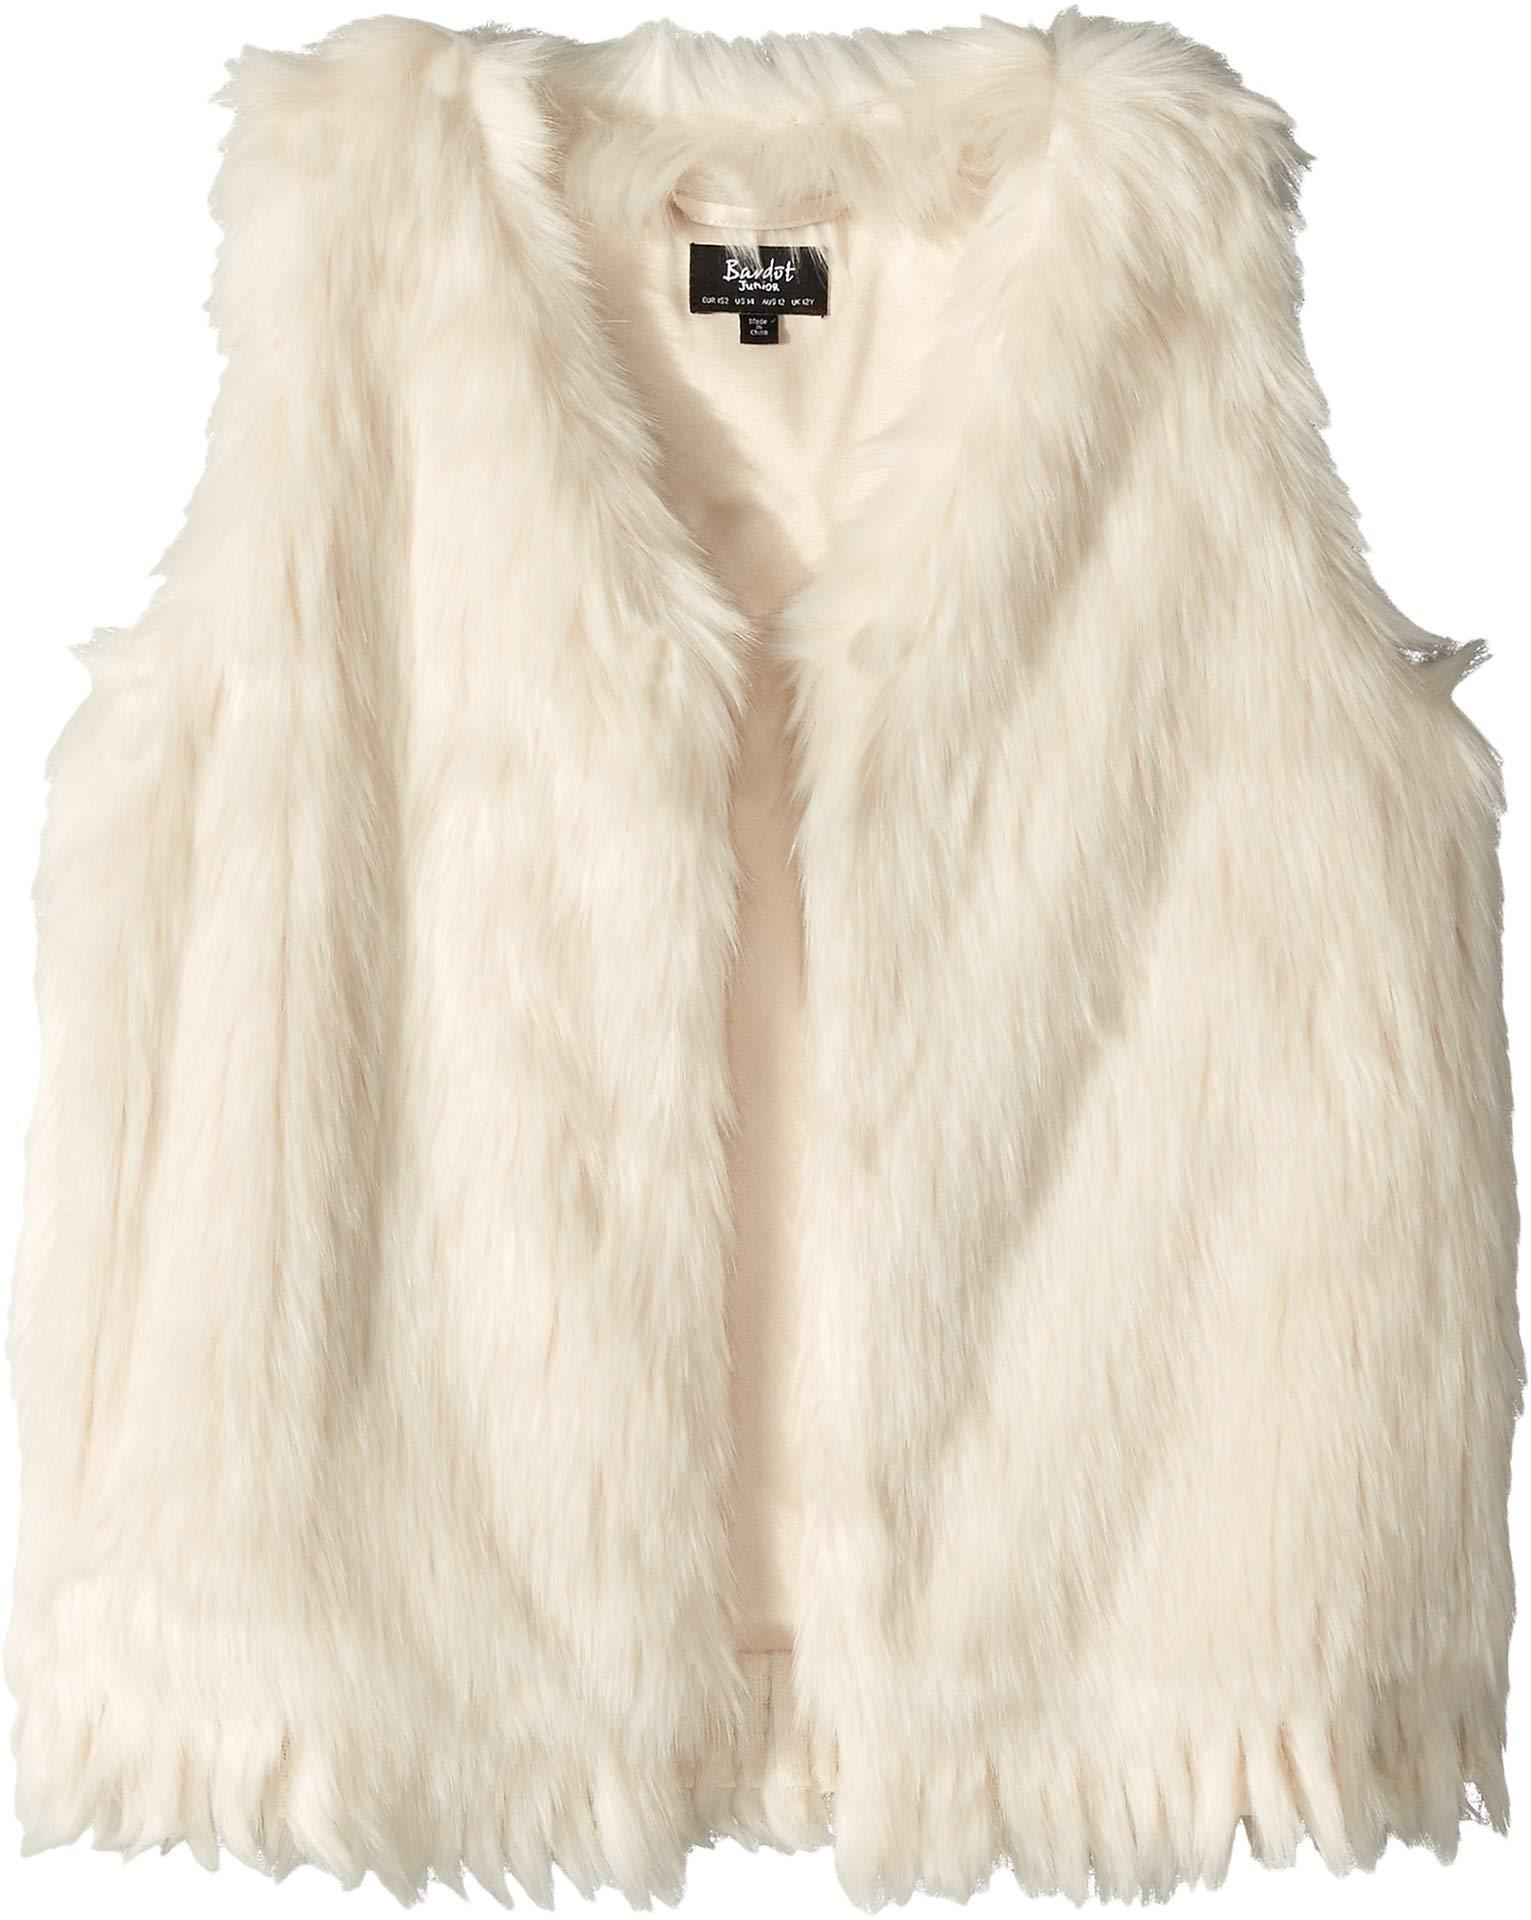 Bardot Junior Girl's Fur Waistcoat (Big Kids) Pebble Ivory 14 (US 16 Big Kids) by Bardot Junior